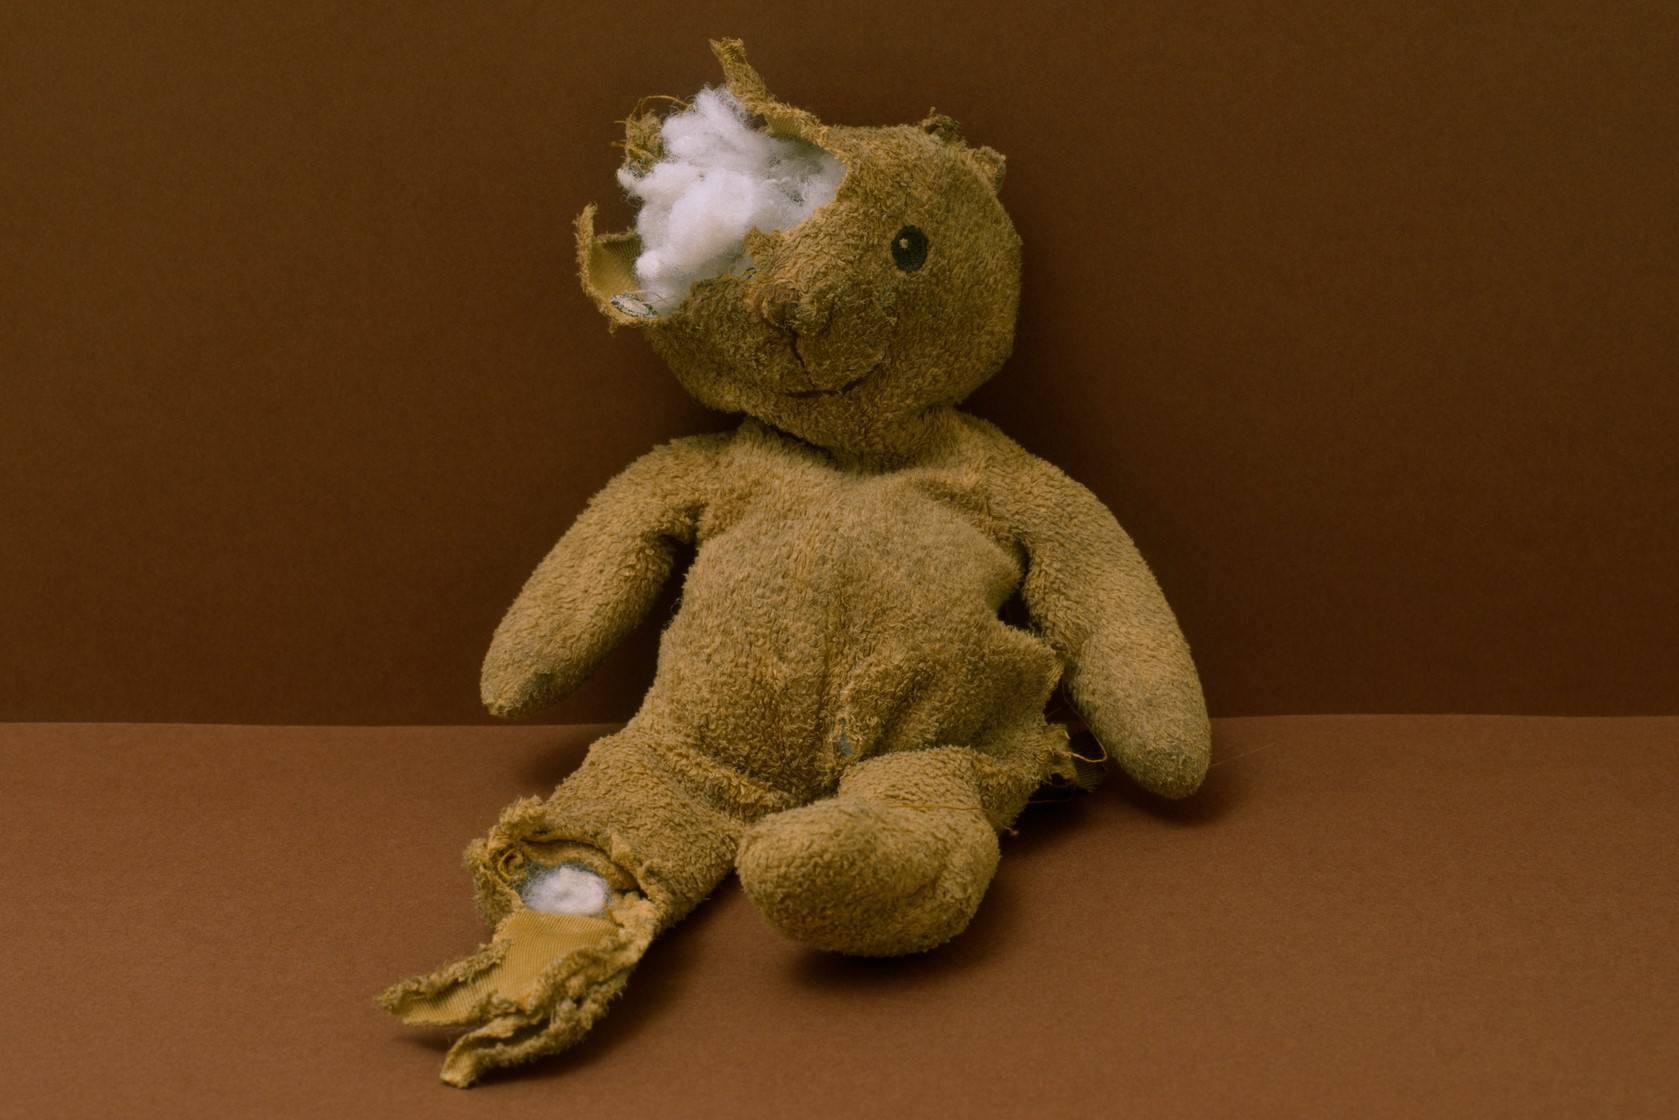 Torn up stuffed animal